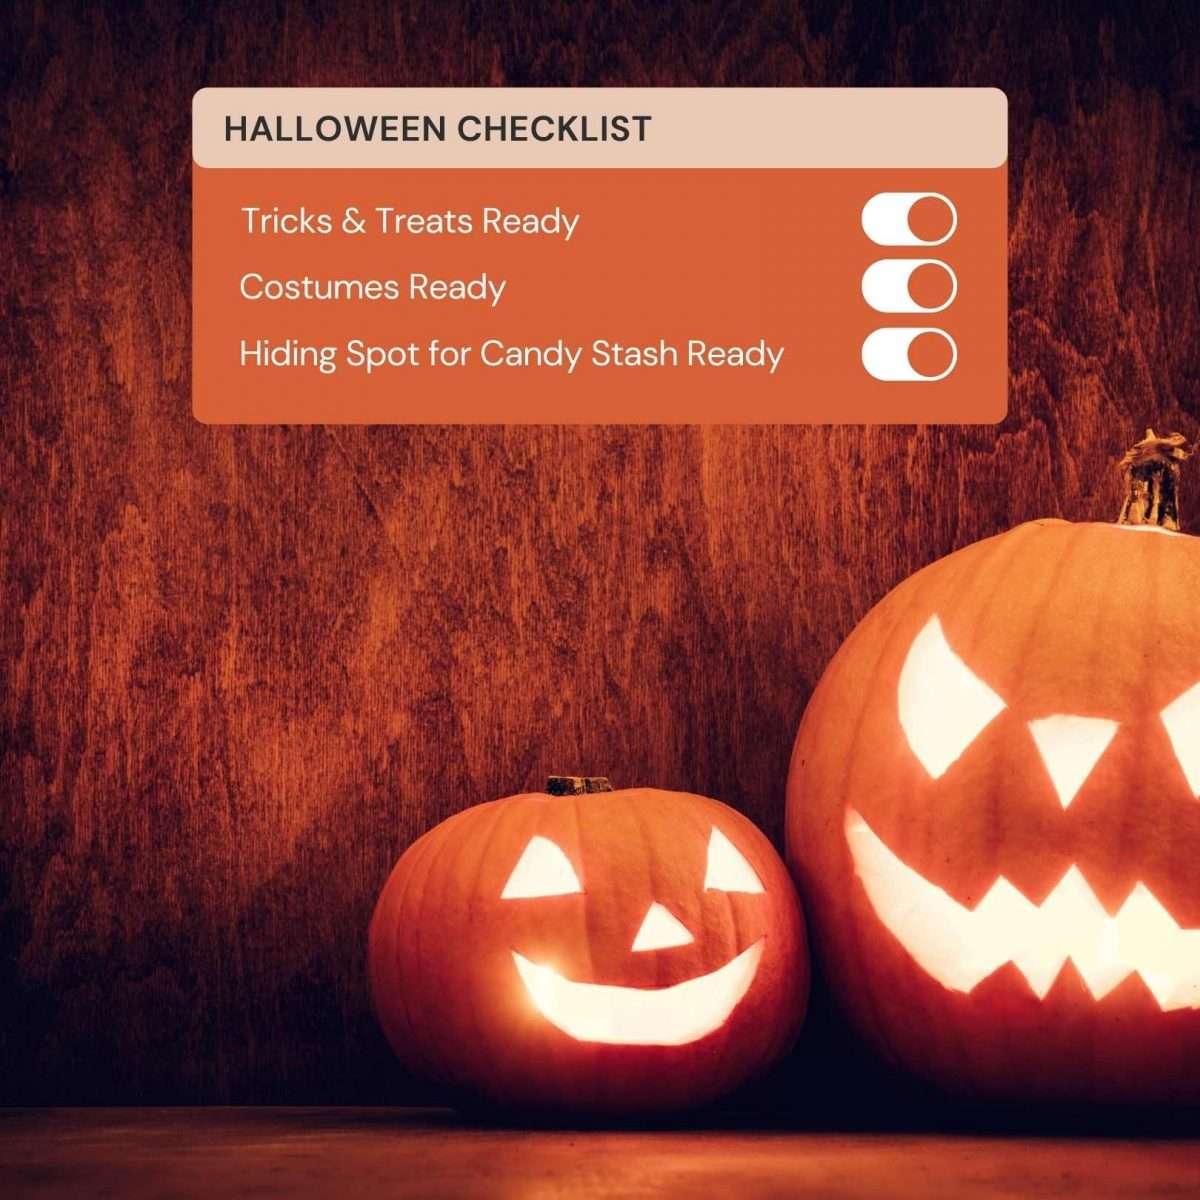 Halloween Checklist Canva Template - Editable Canva Template by Socially Sorted